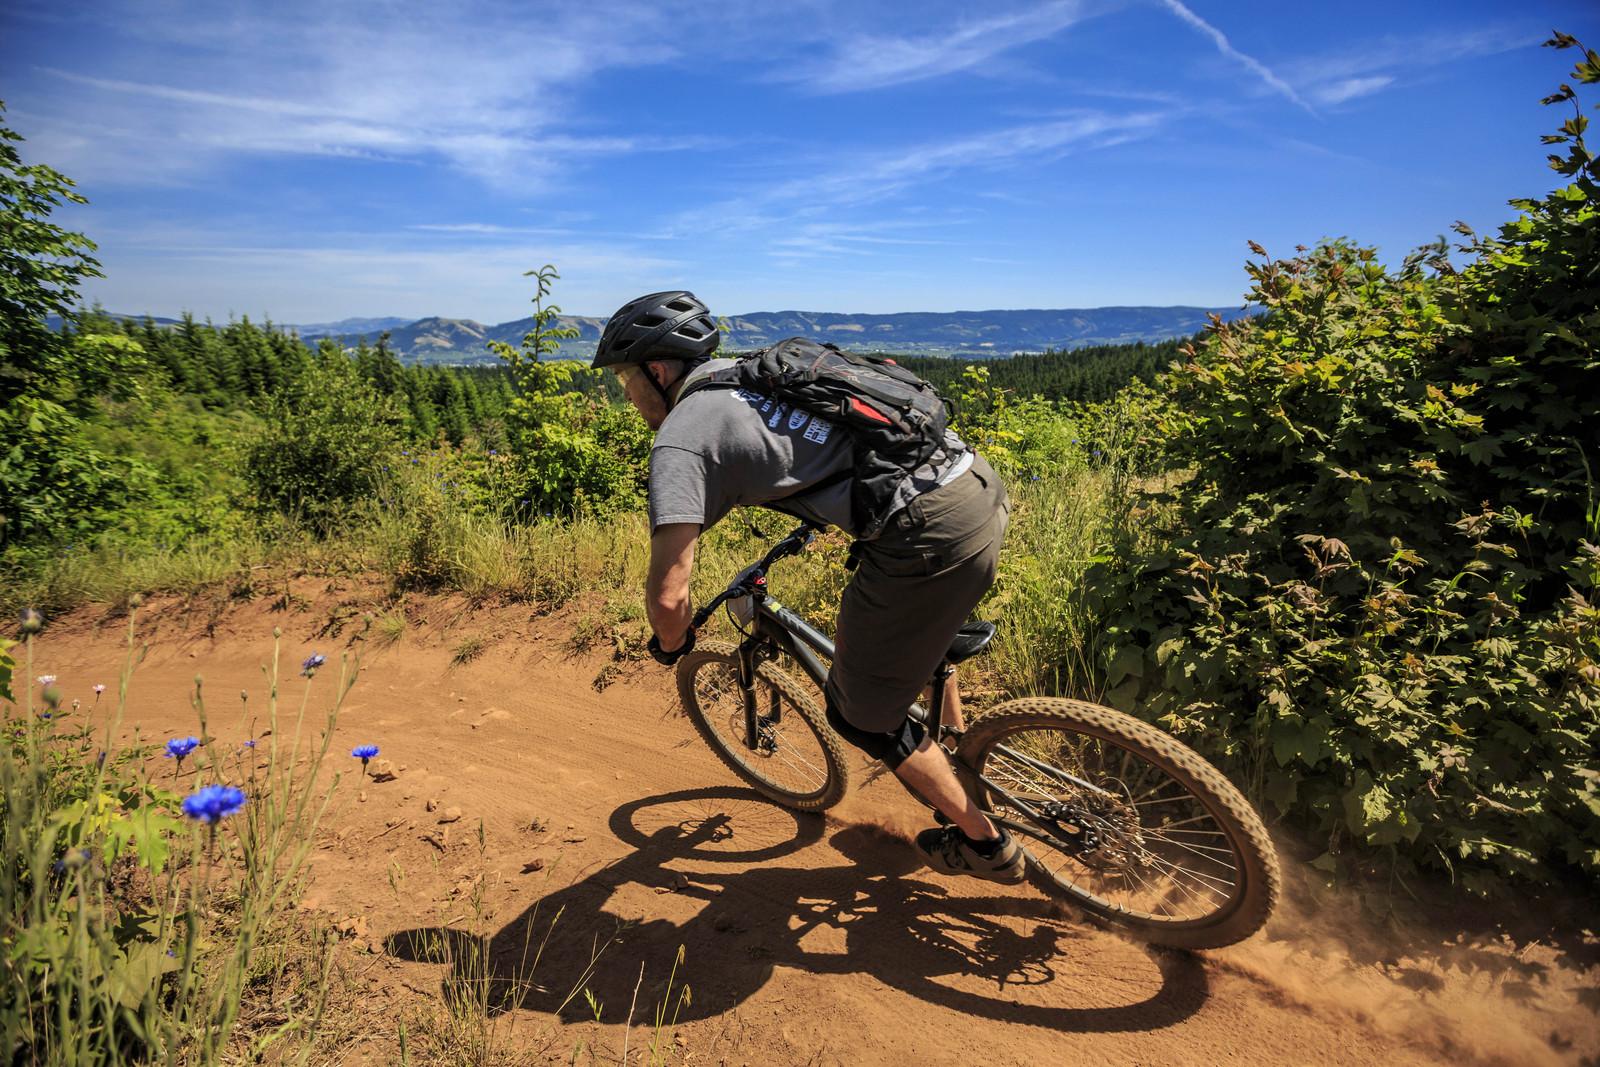 Epic Scenery in Hood River - Oregon Enduro Hood River - Mountain Biking Pictures - Vital MTB